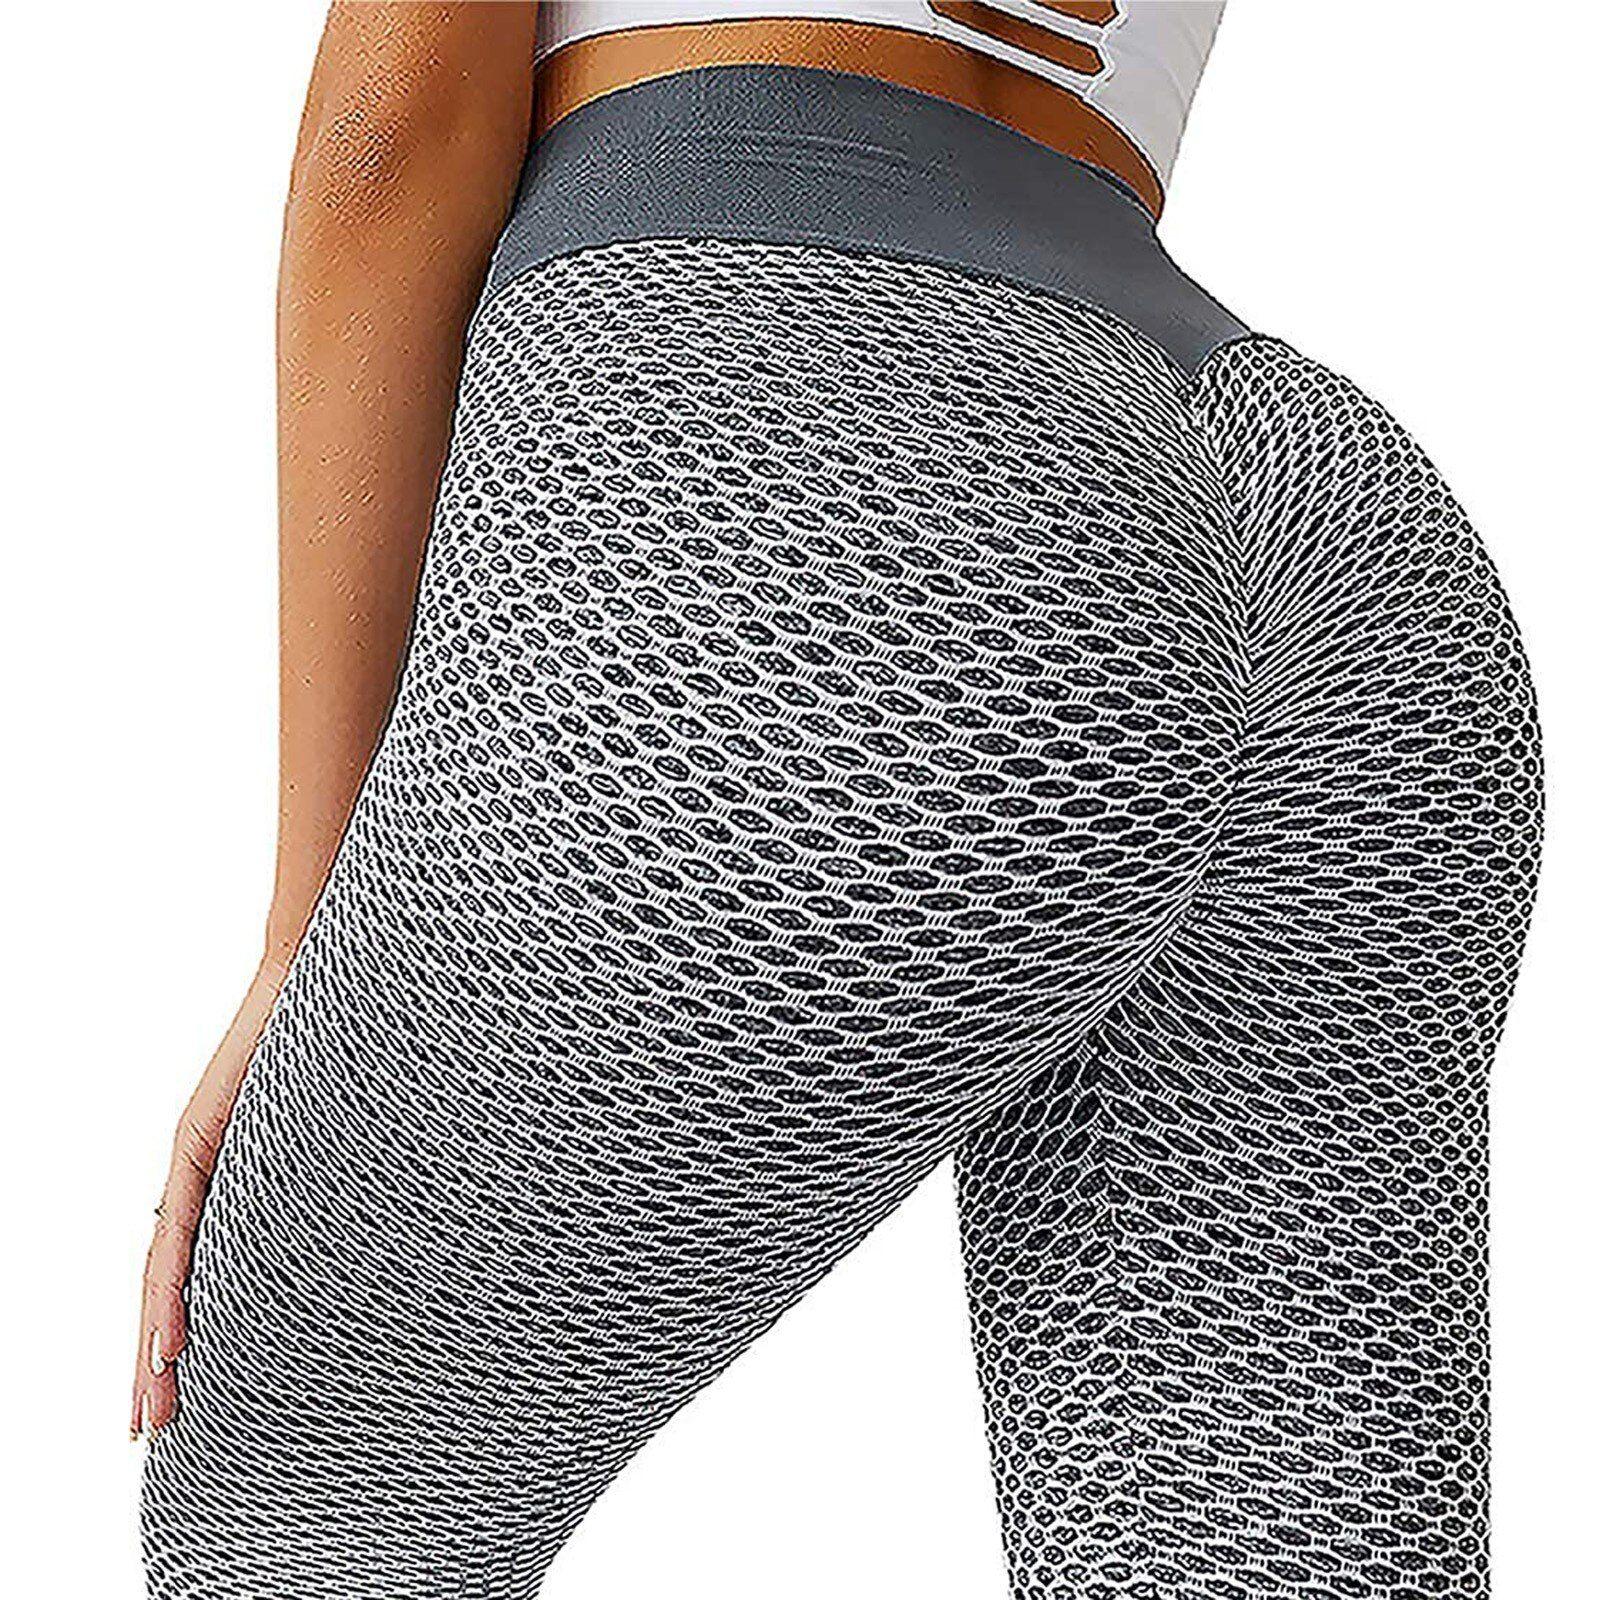 DAIGELO Seamless Fitness Women Leggings Fashion Patchwork Print High Waist Elastic Push Up Ankle Length Polyester Leggings